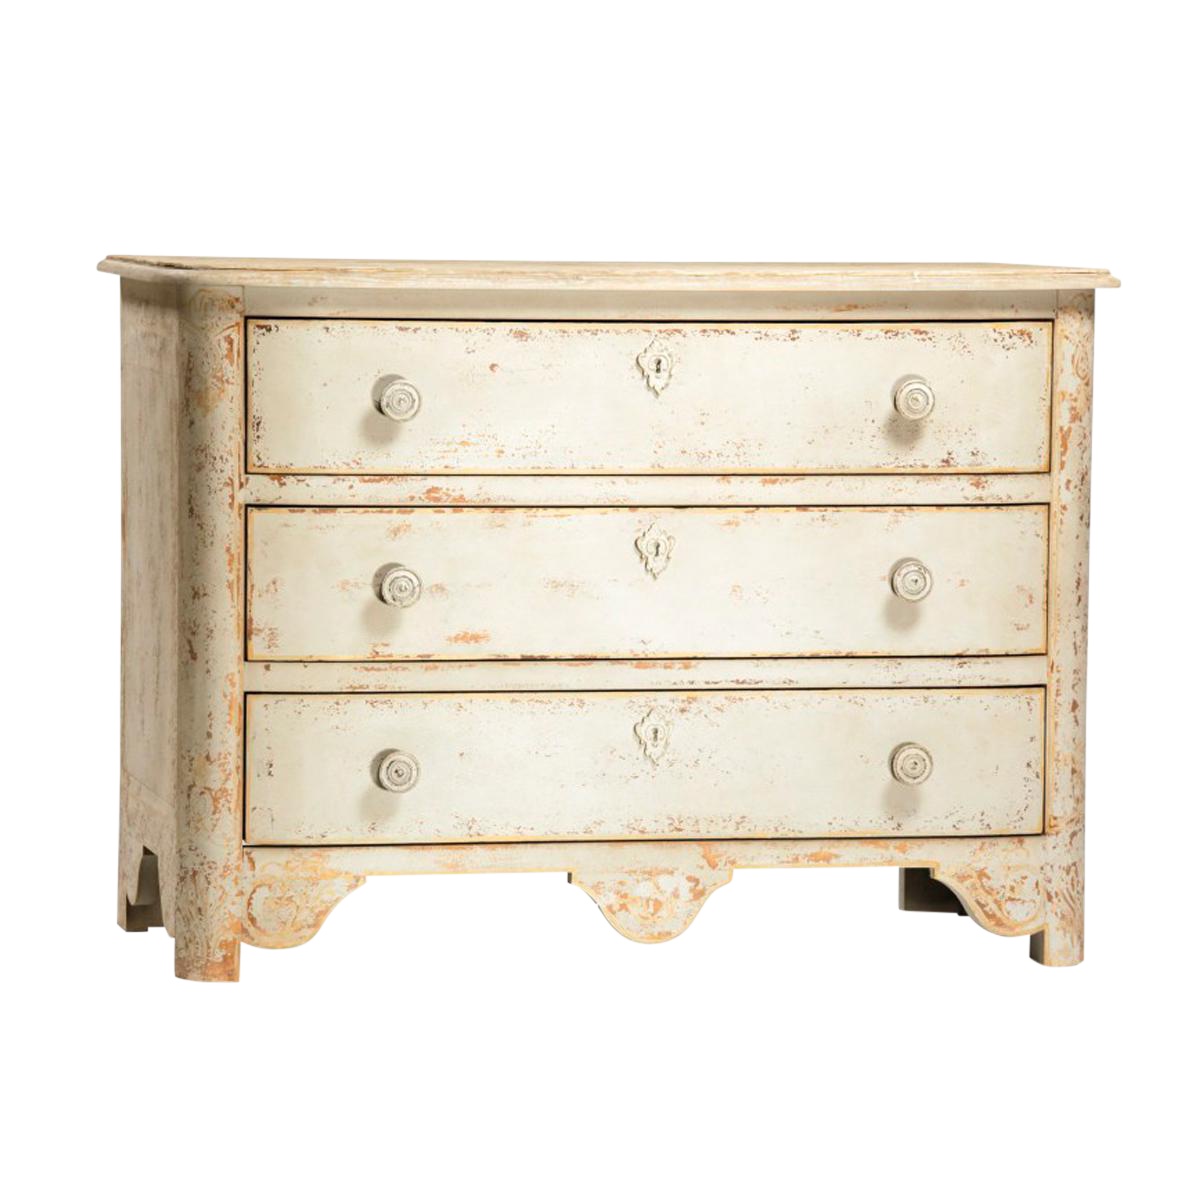 antique 3 drawer dresser with iron handles